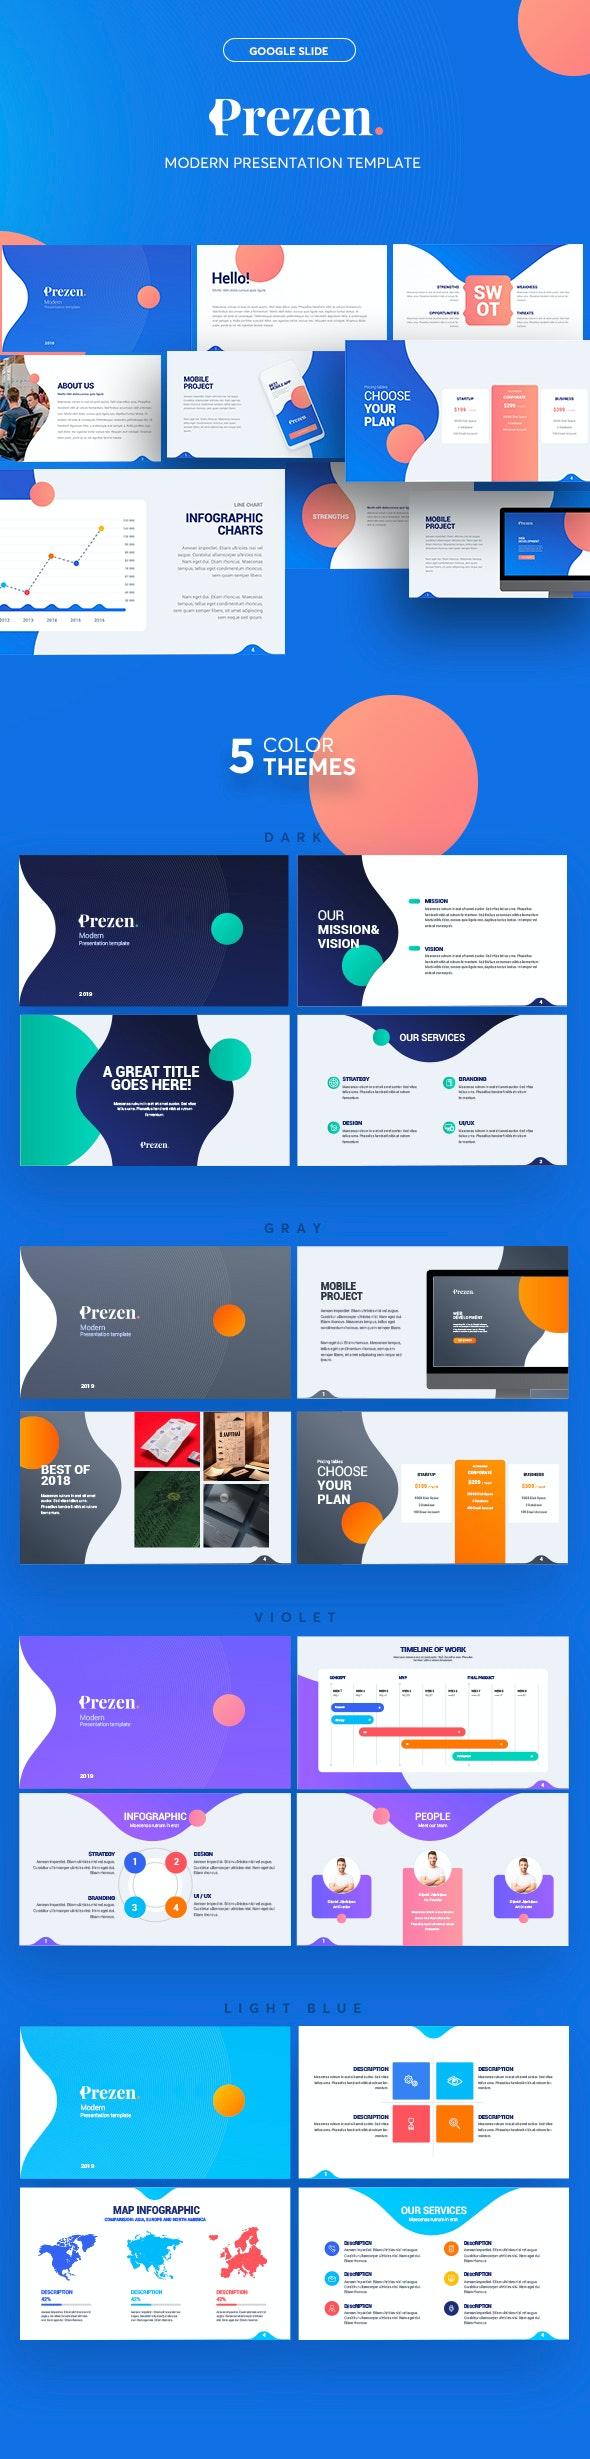 Prezen - Modern Google Slide Template - Google Slides Presentation Templates